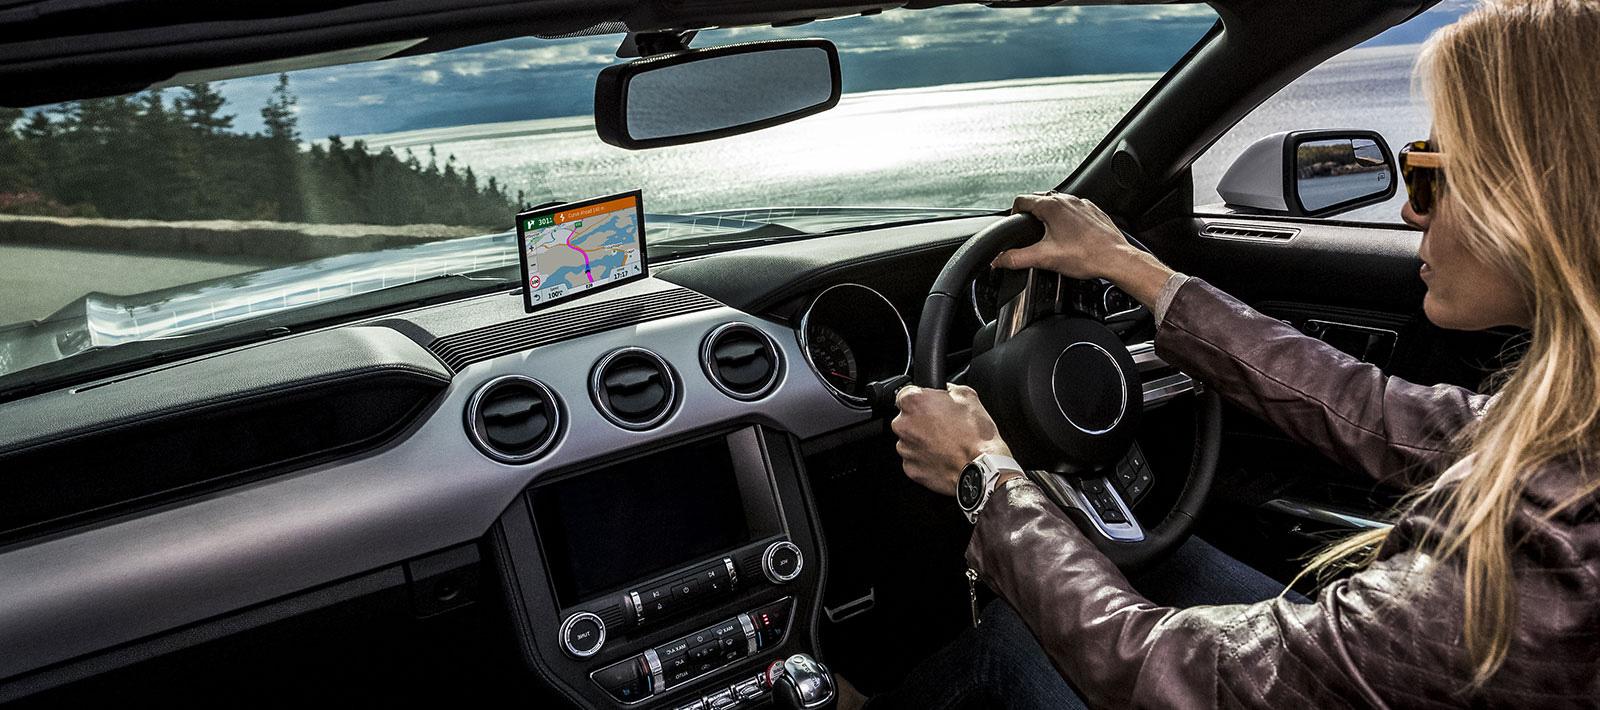 Garmin-GPS